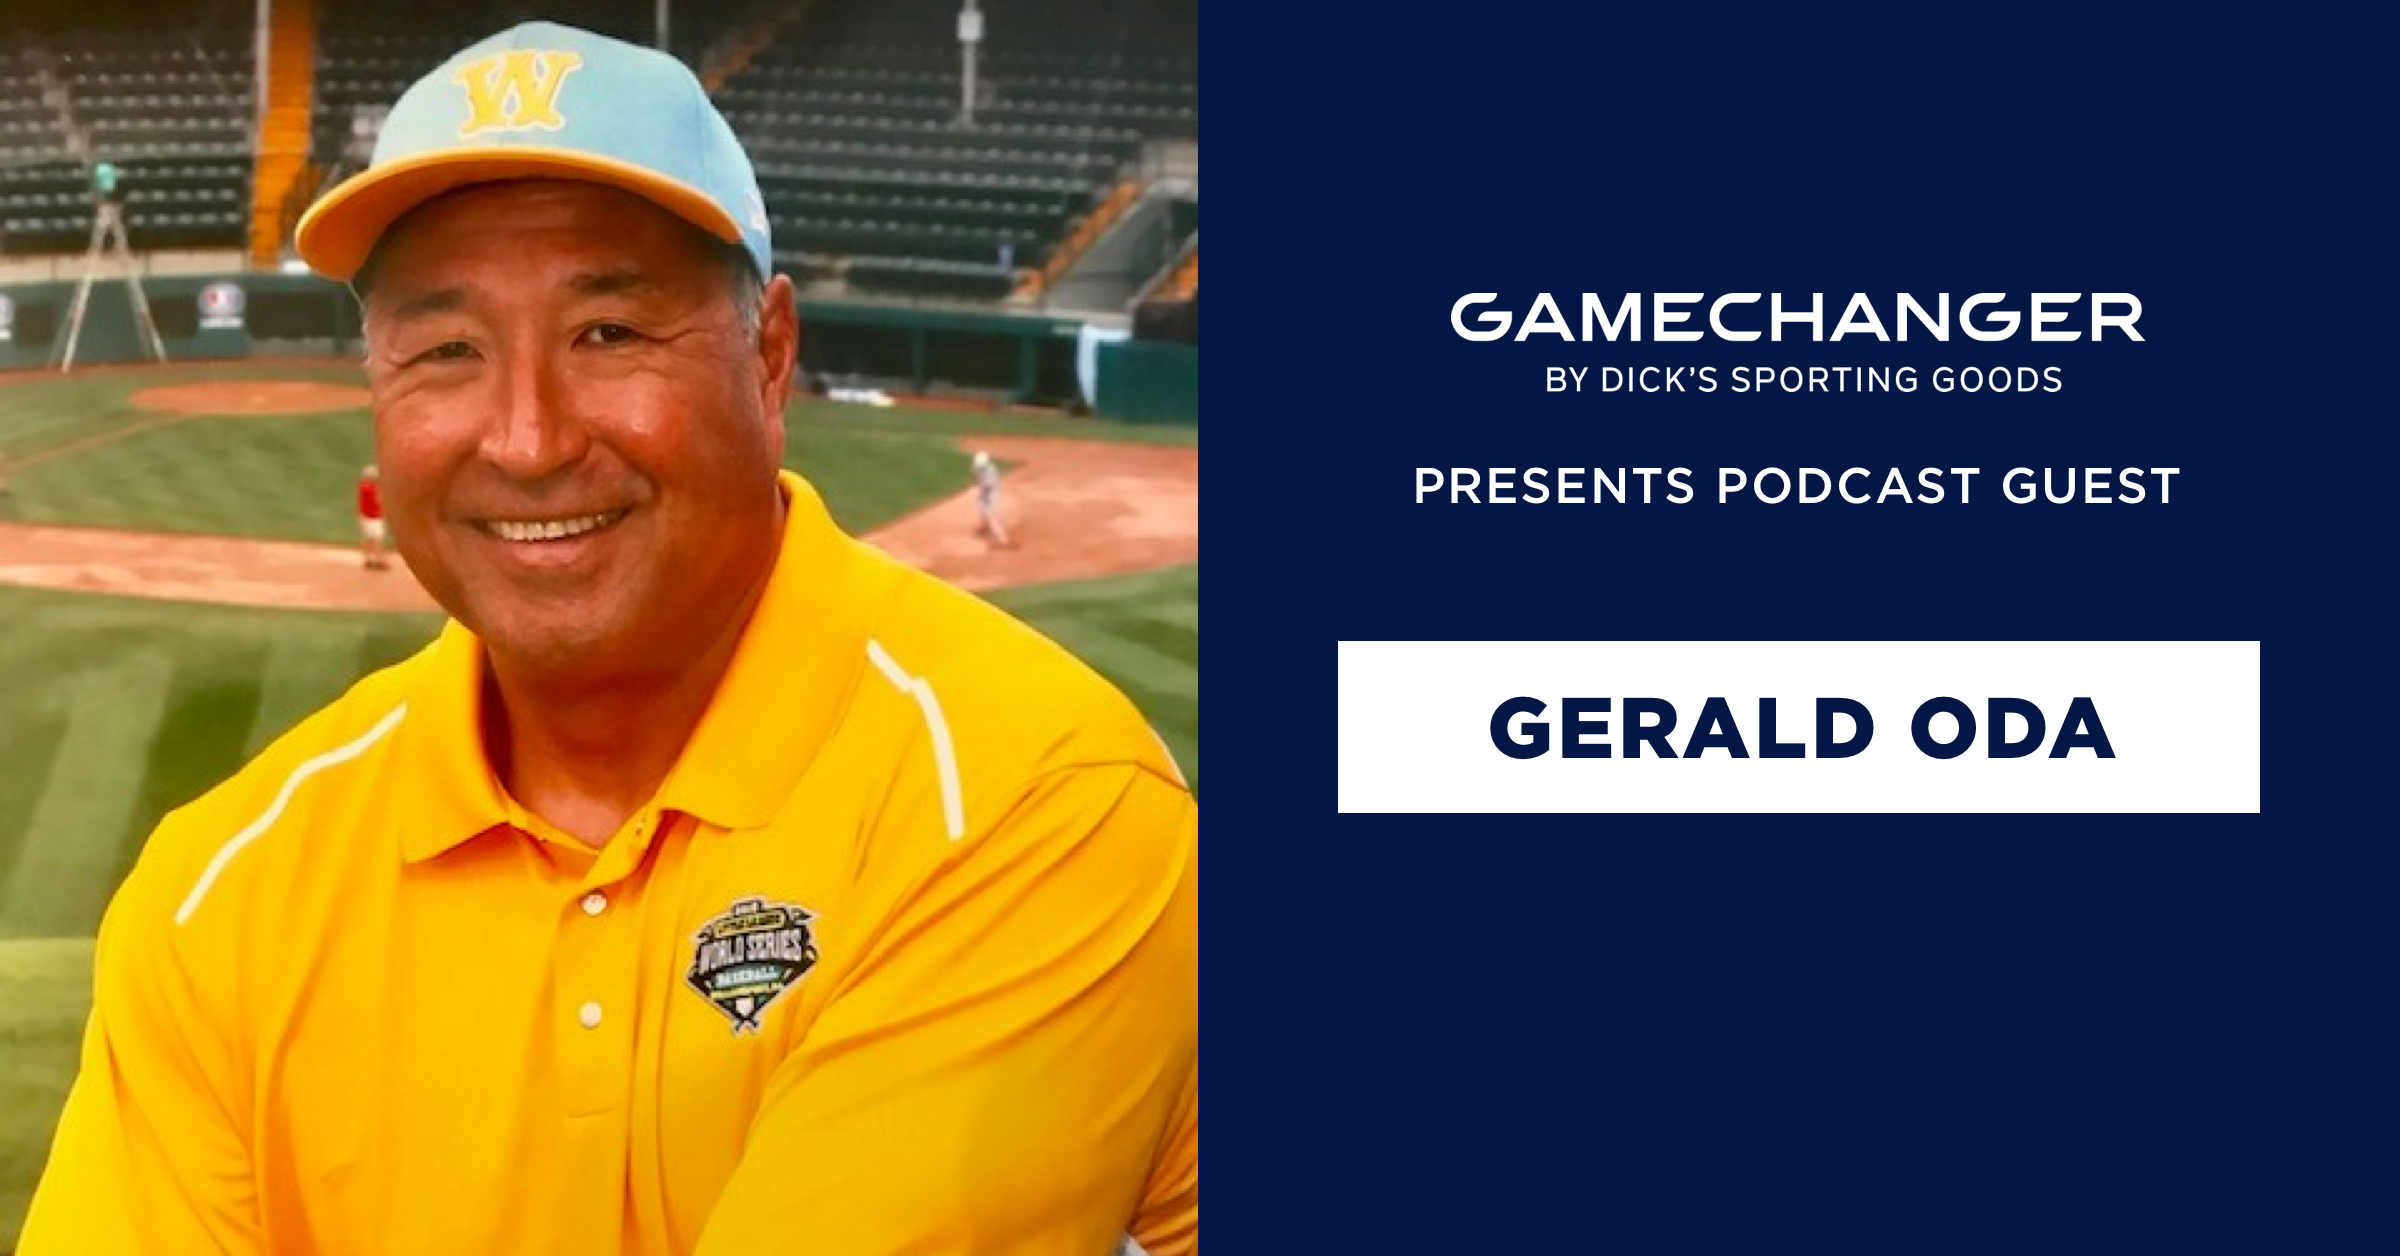 Gerald Oda: Head Coach of the 2018 Little League World